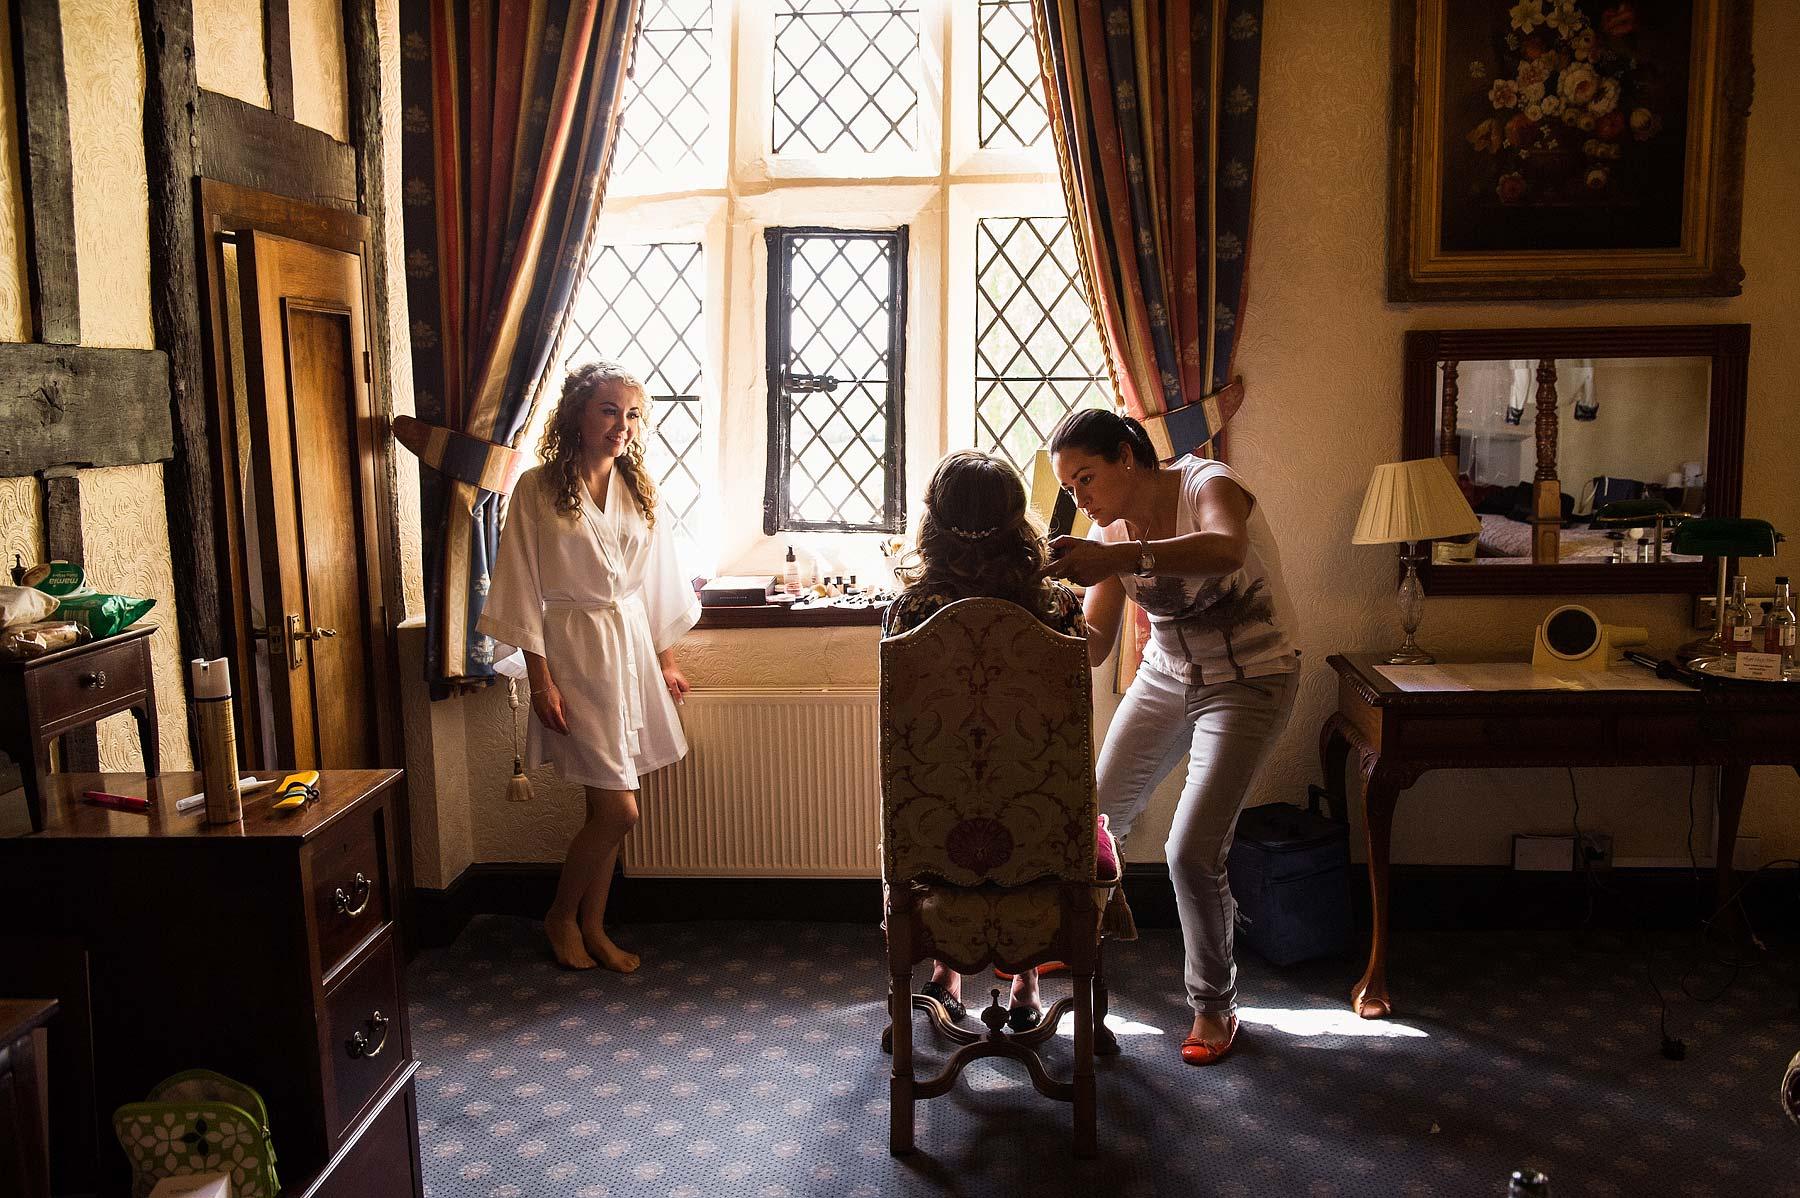 albright-hussey-manor-wedding-photographers-008